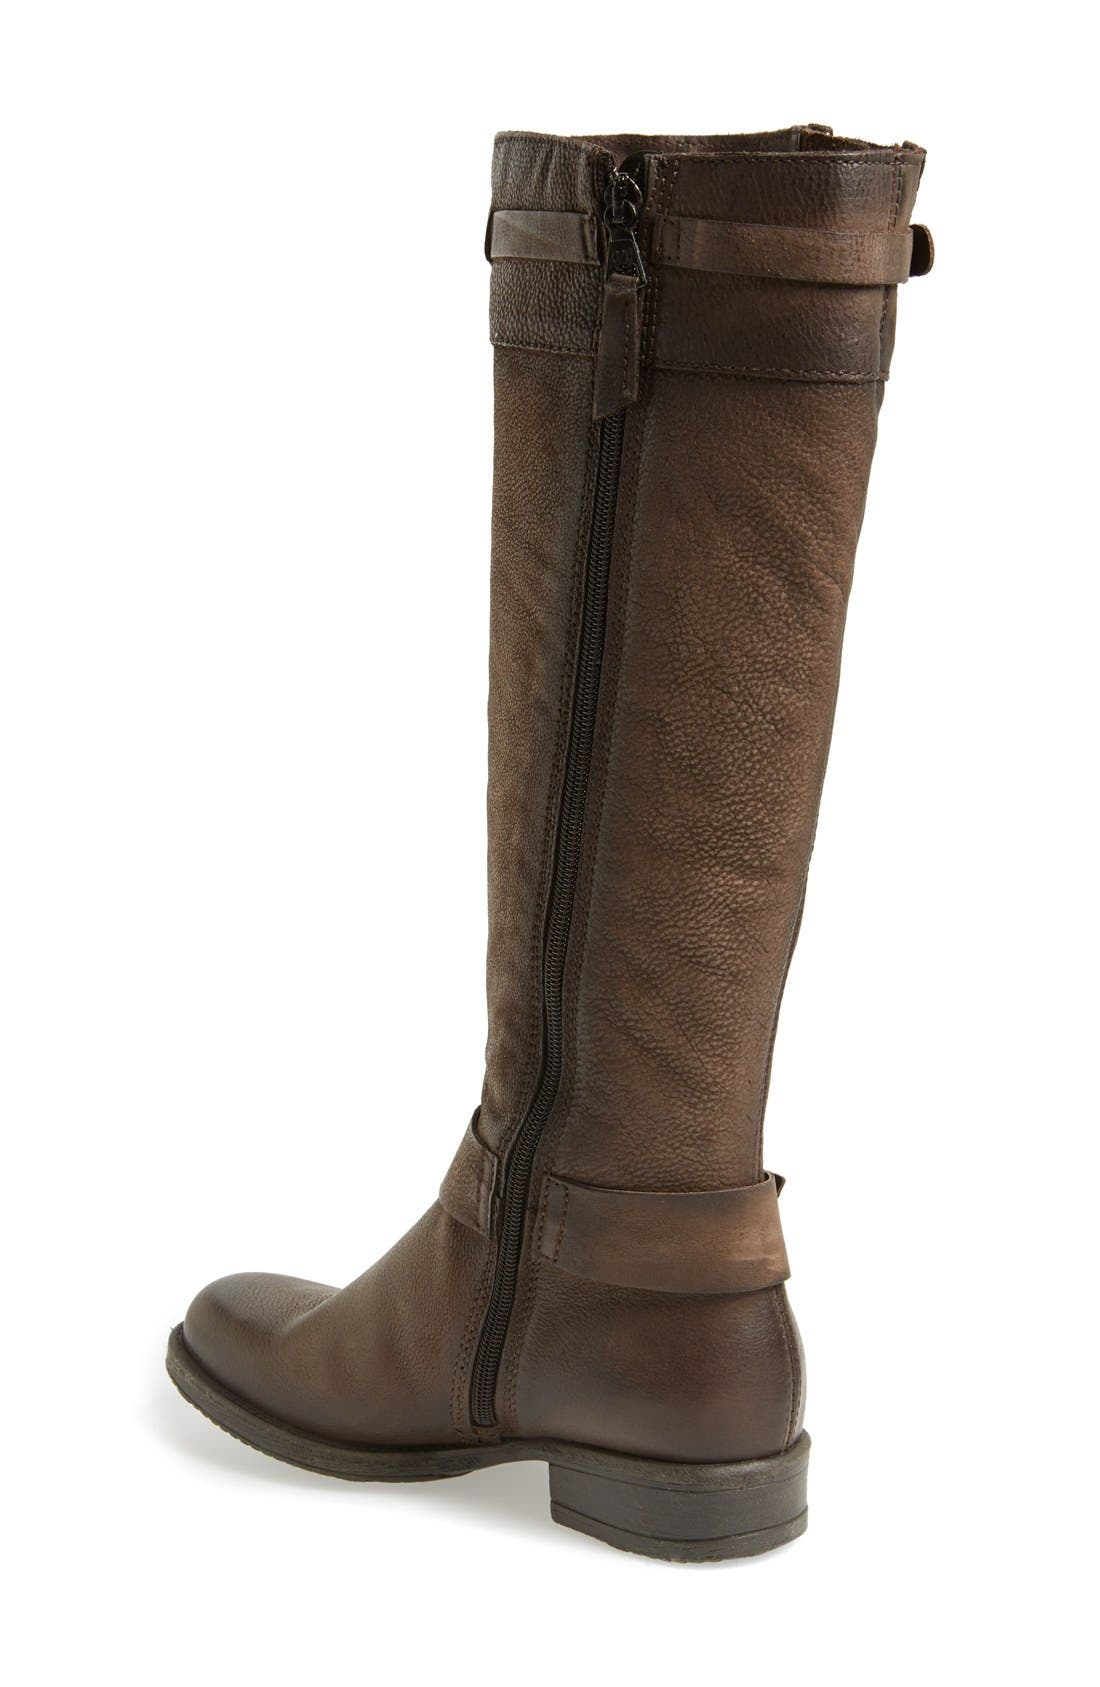 Alternate Image 2  - Miz Mooz 'Nicola' Riding Boot (Women)